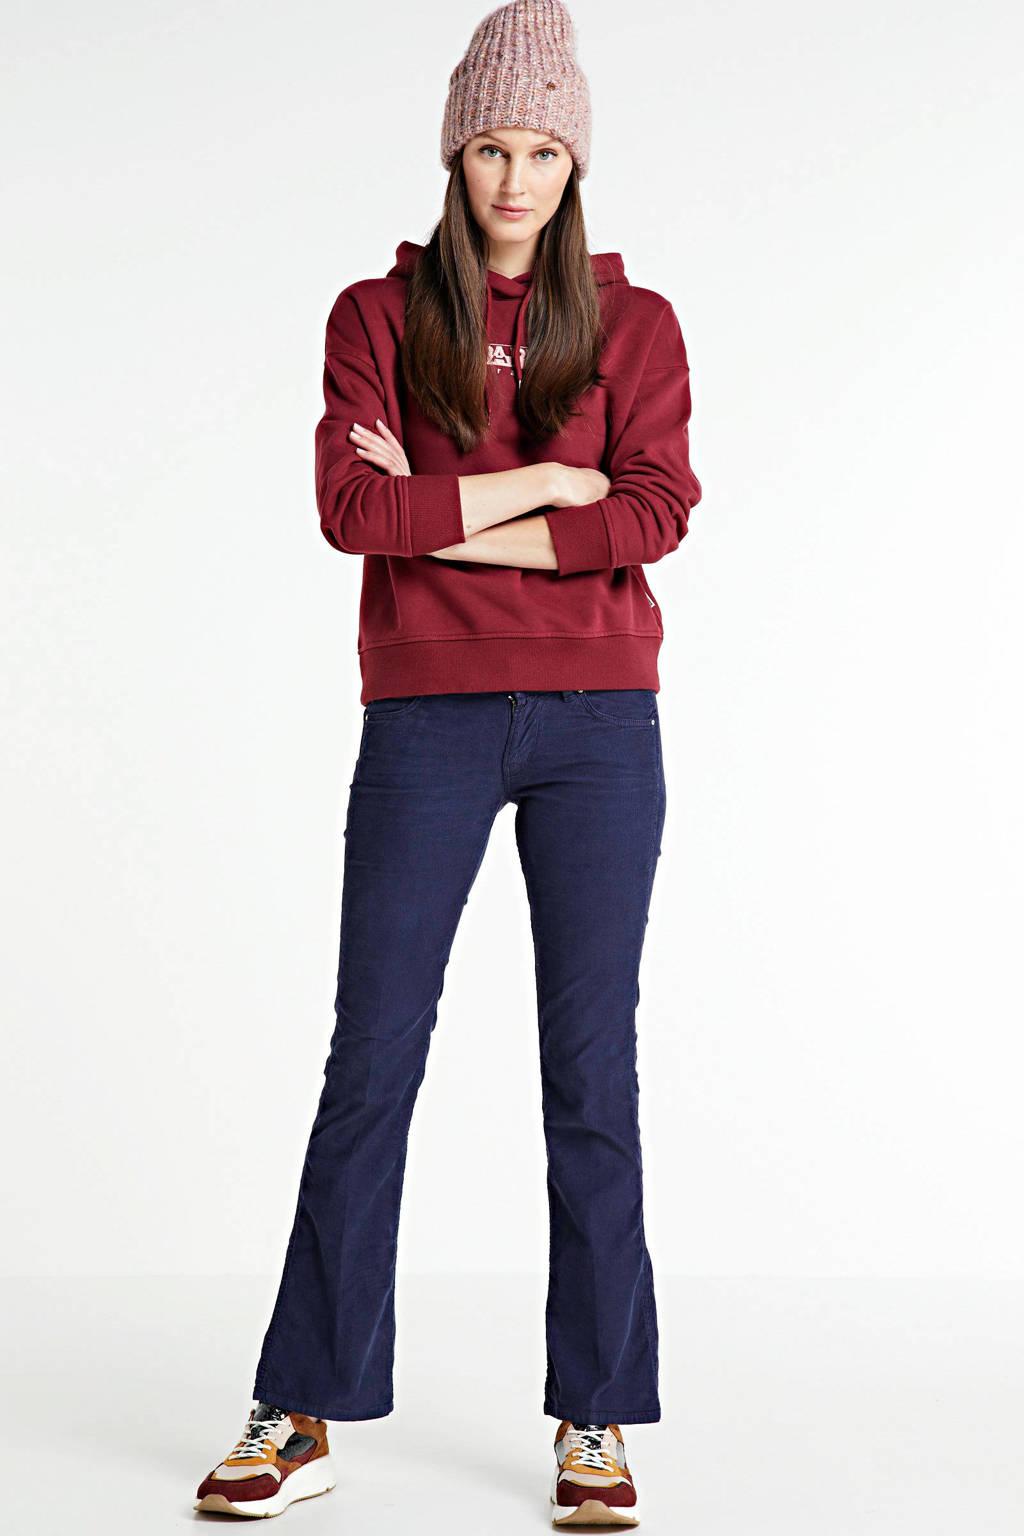 Pepe Jeans broek AZUL MARINO navy595, NAVY595